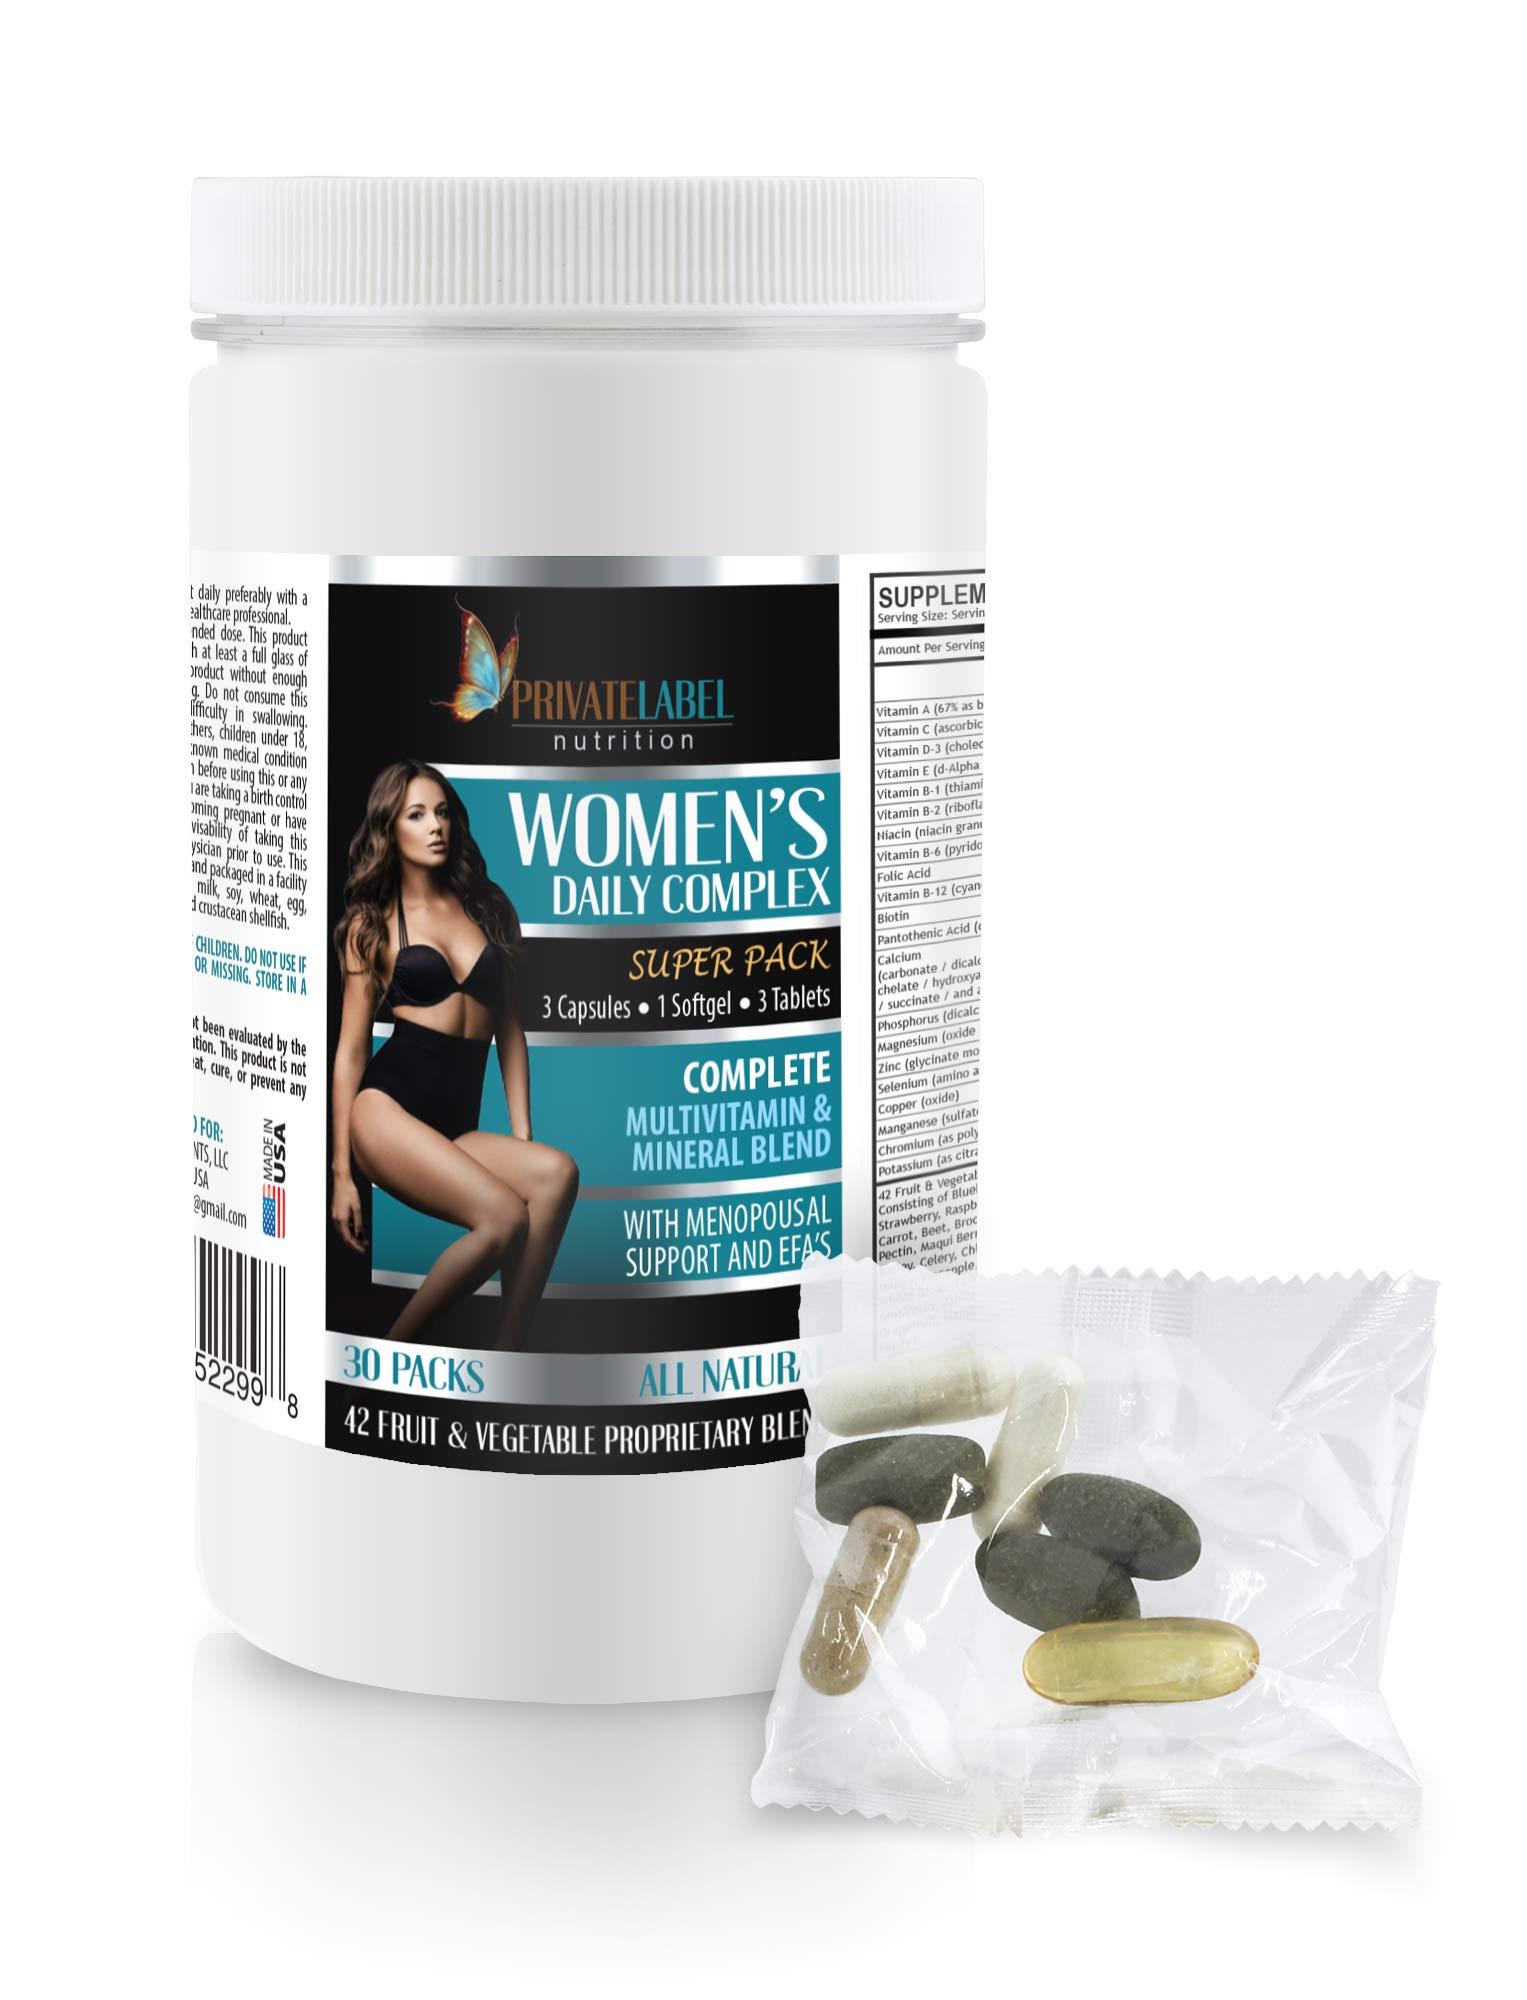 Menopause Supplements Weight Control - Women's Daily Complex - Super Pack - Green Tea Weight Loss Supplements - 1 Can 30 Packs (210 Pills)